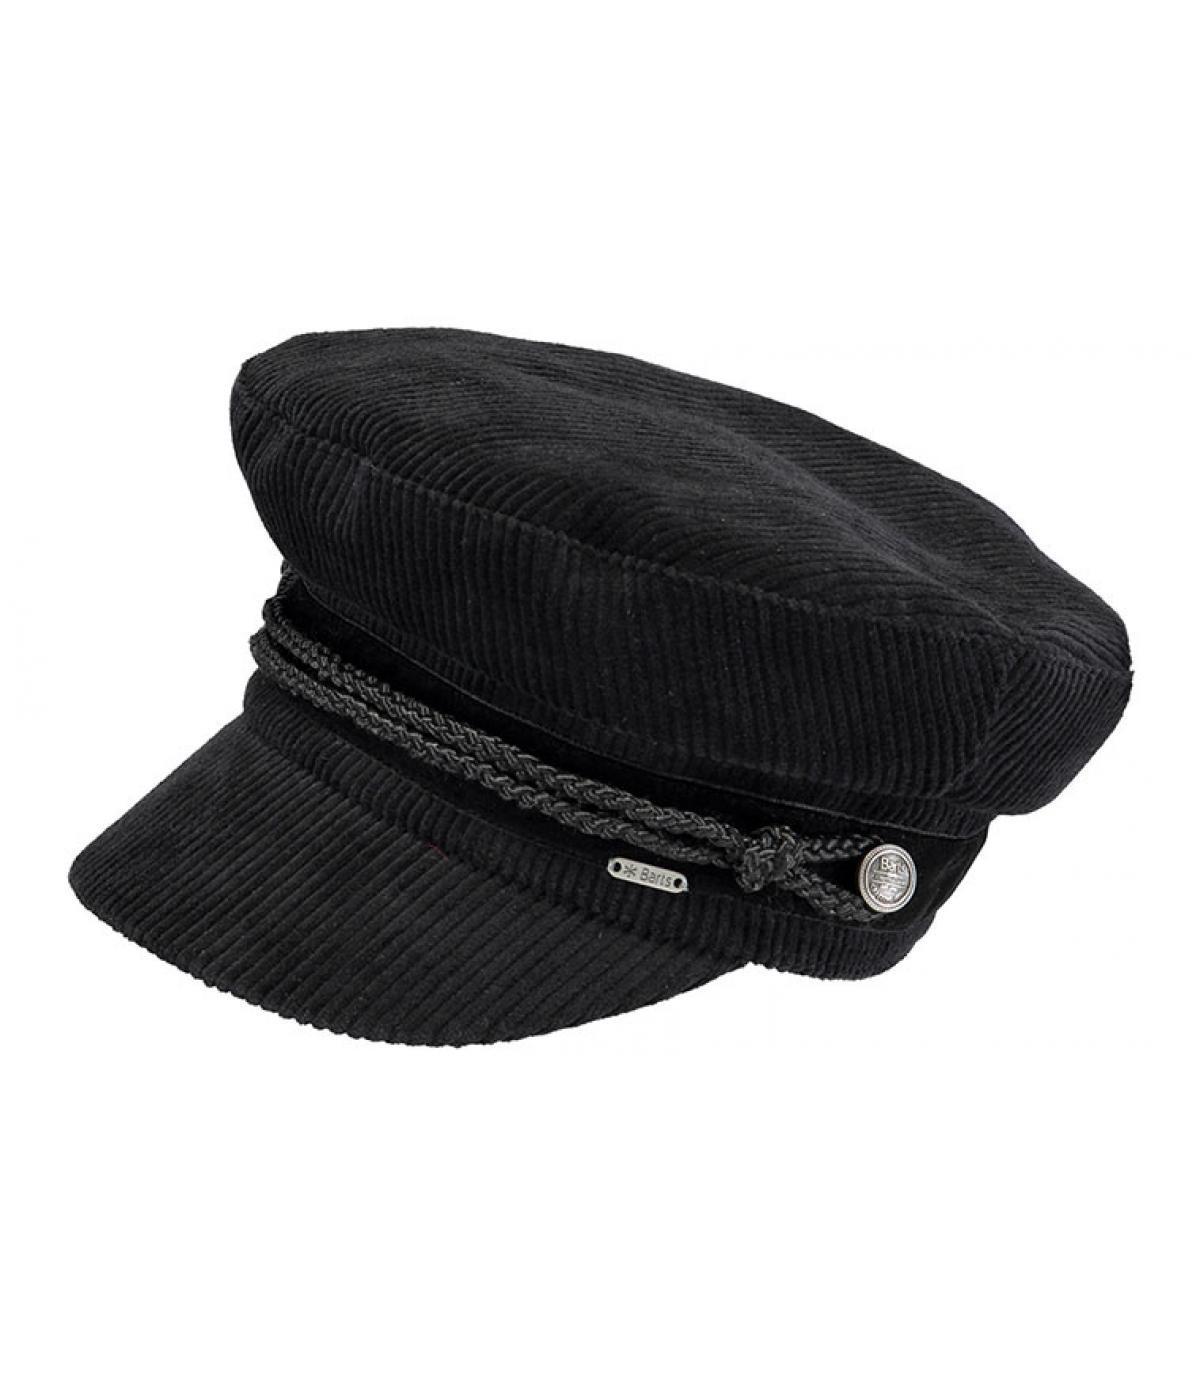 16d9f583e12 Barts cap for men and kids